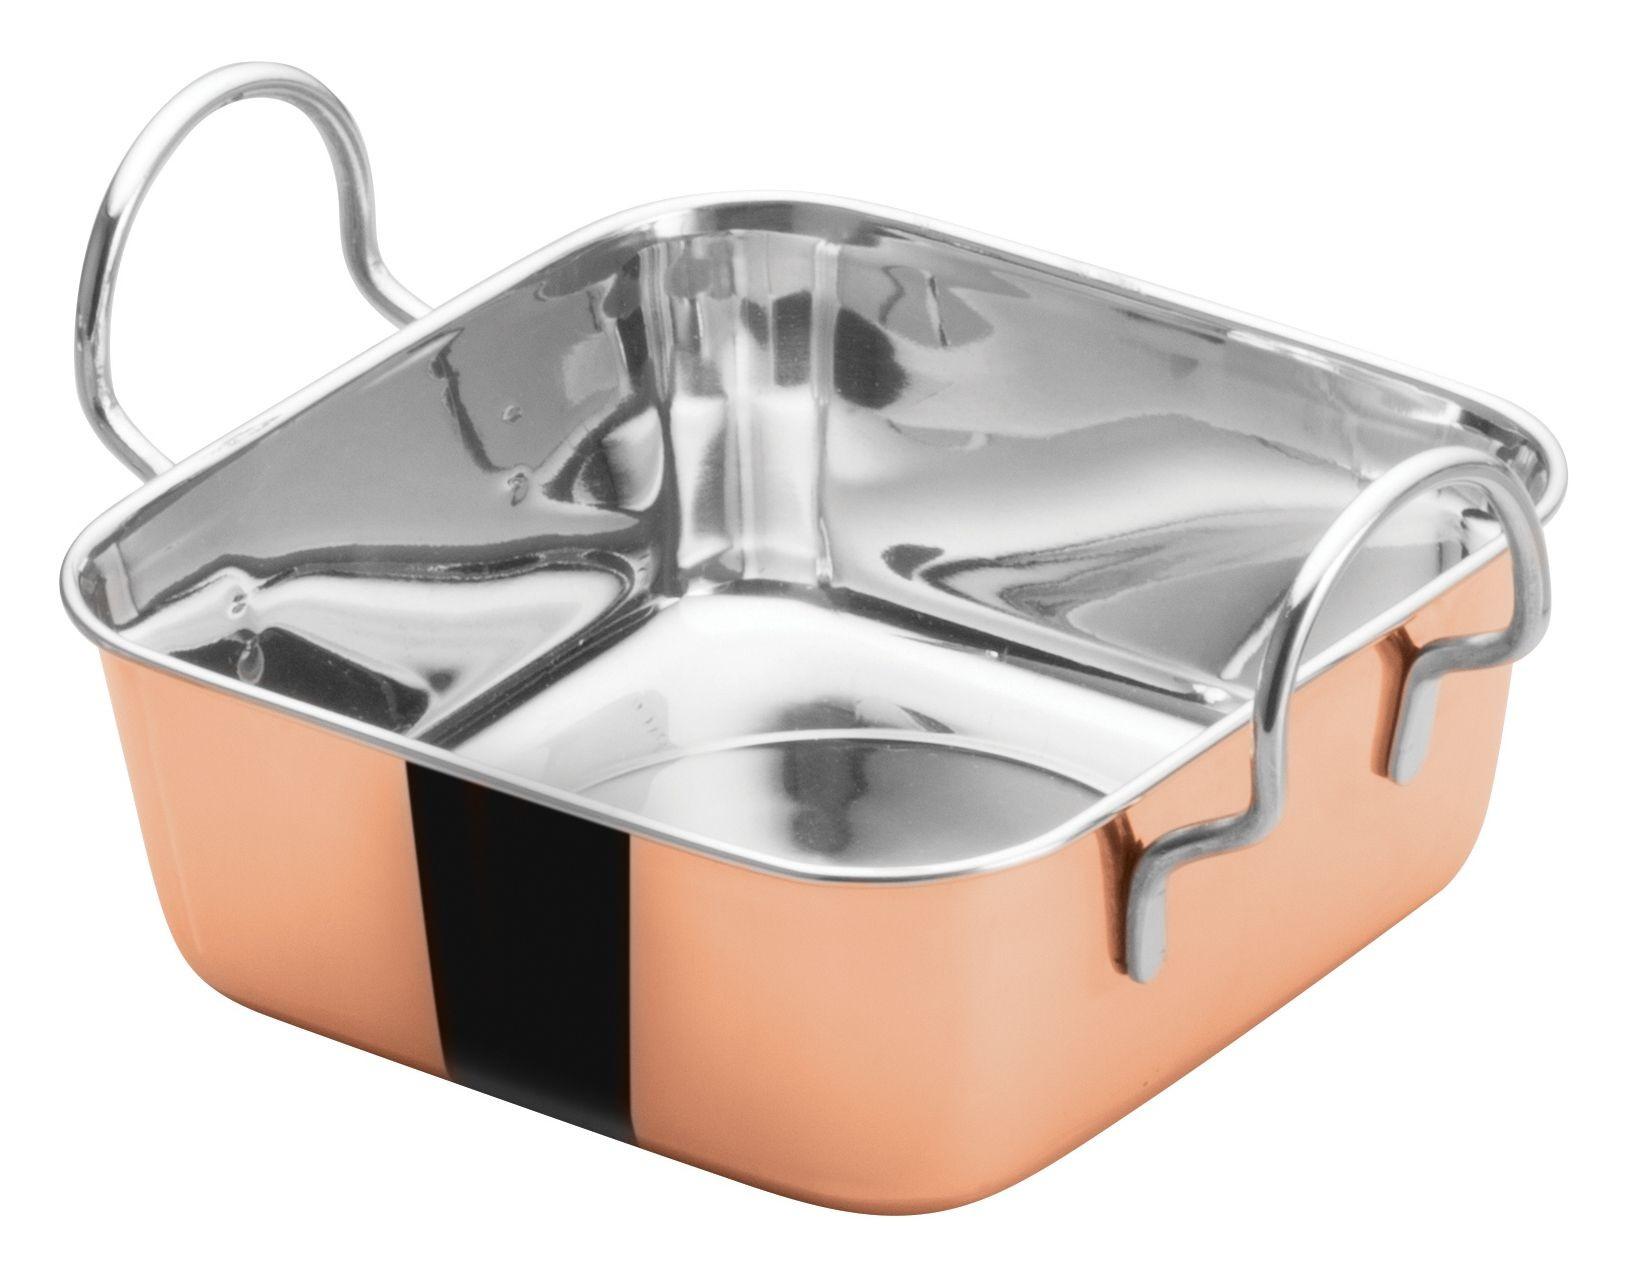 "Winco DDSB-201C Copper Plated 4-1/2"" Mini Roasting Pan"